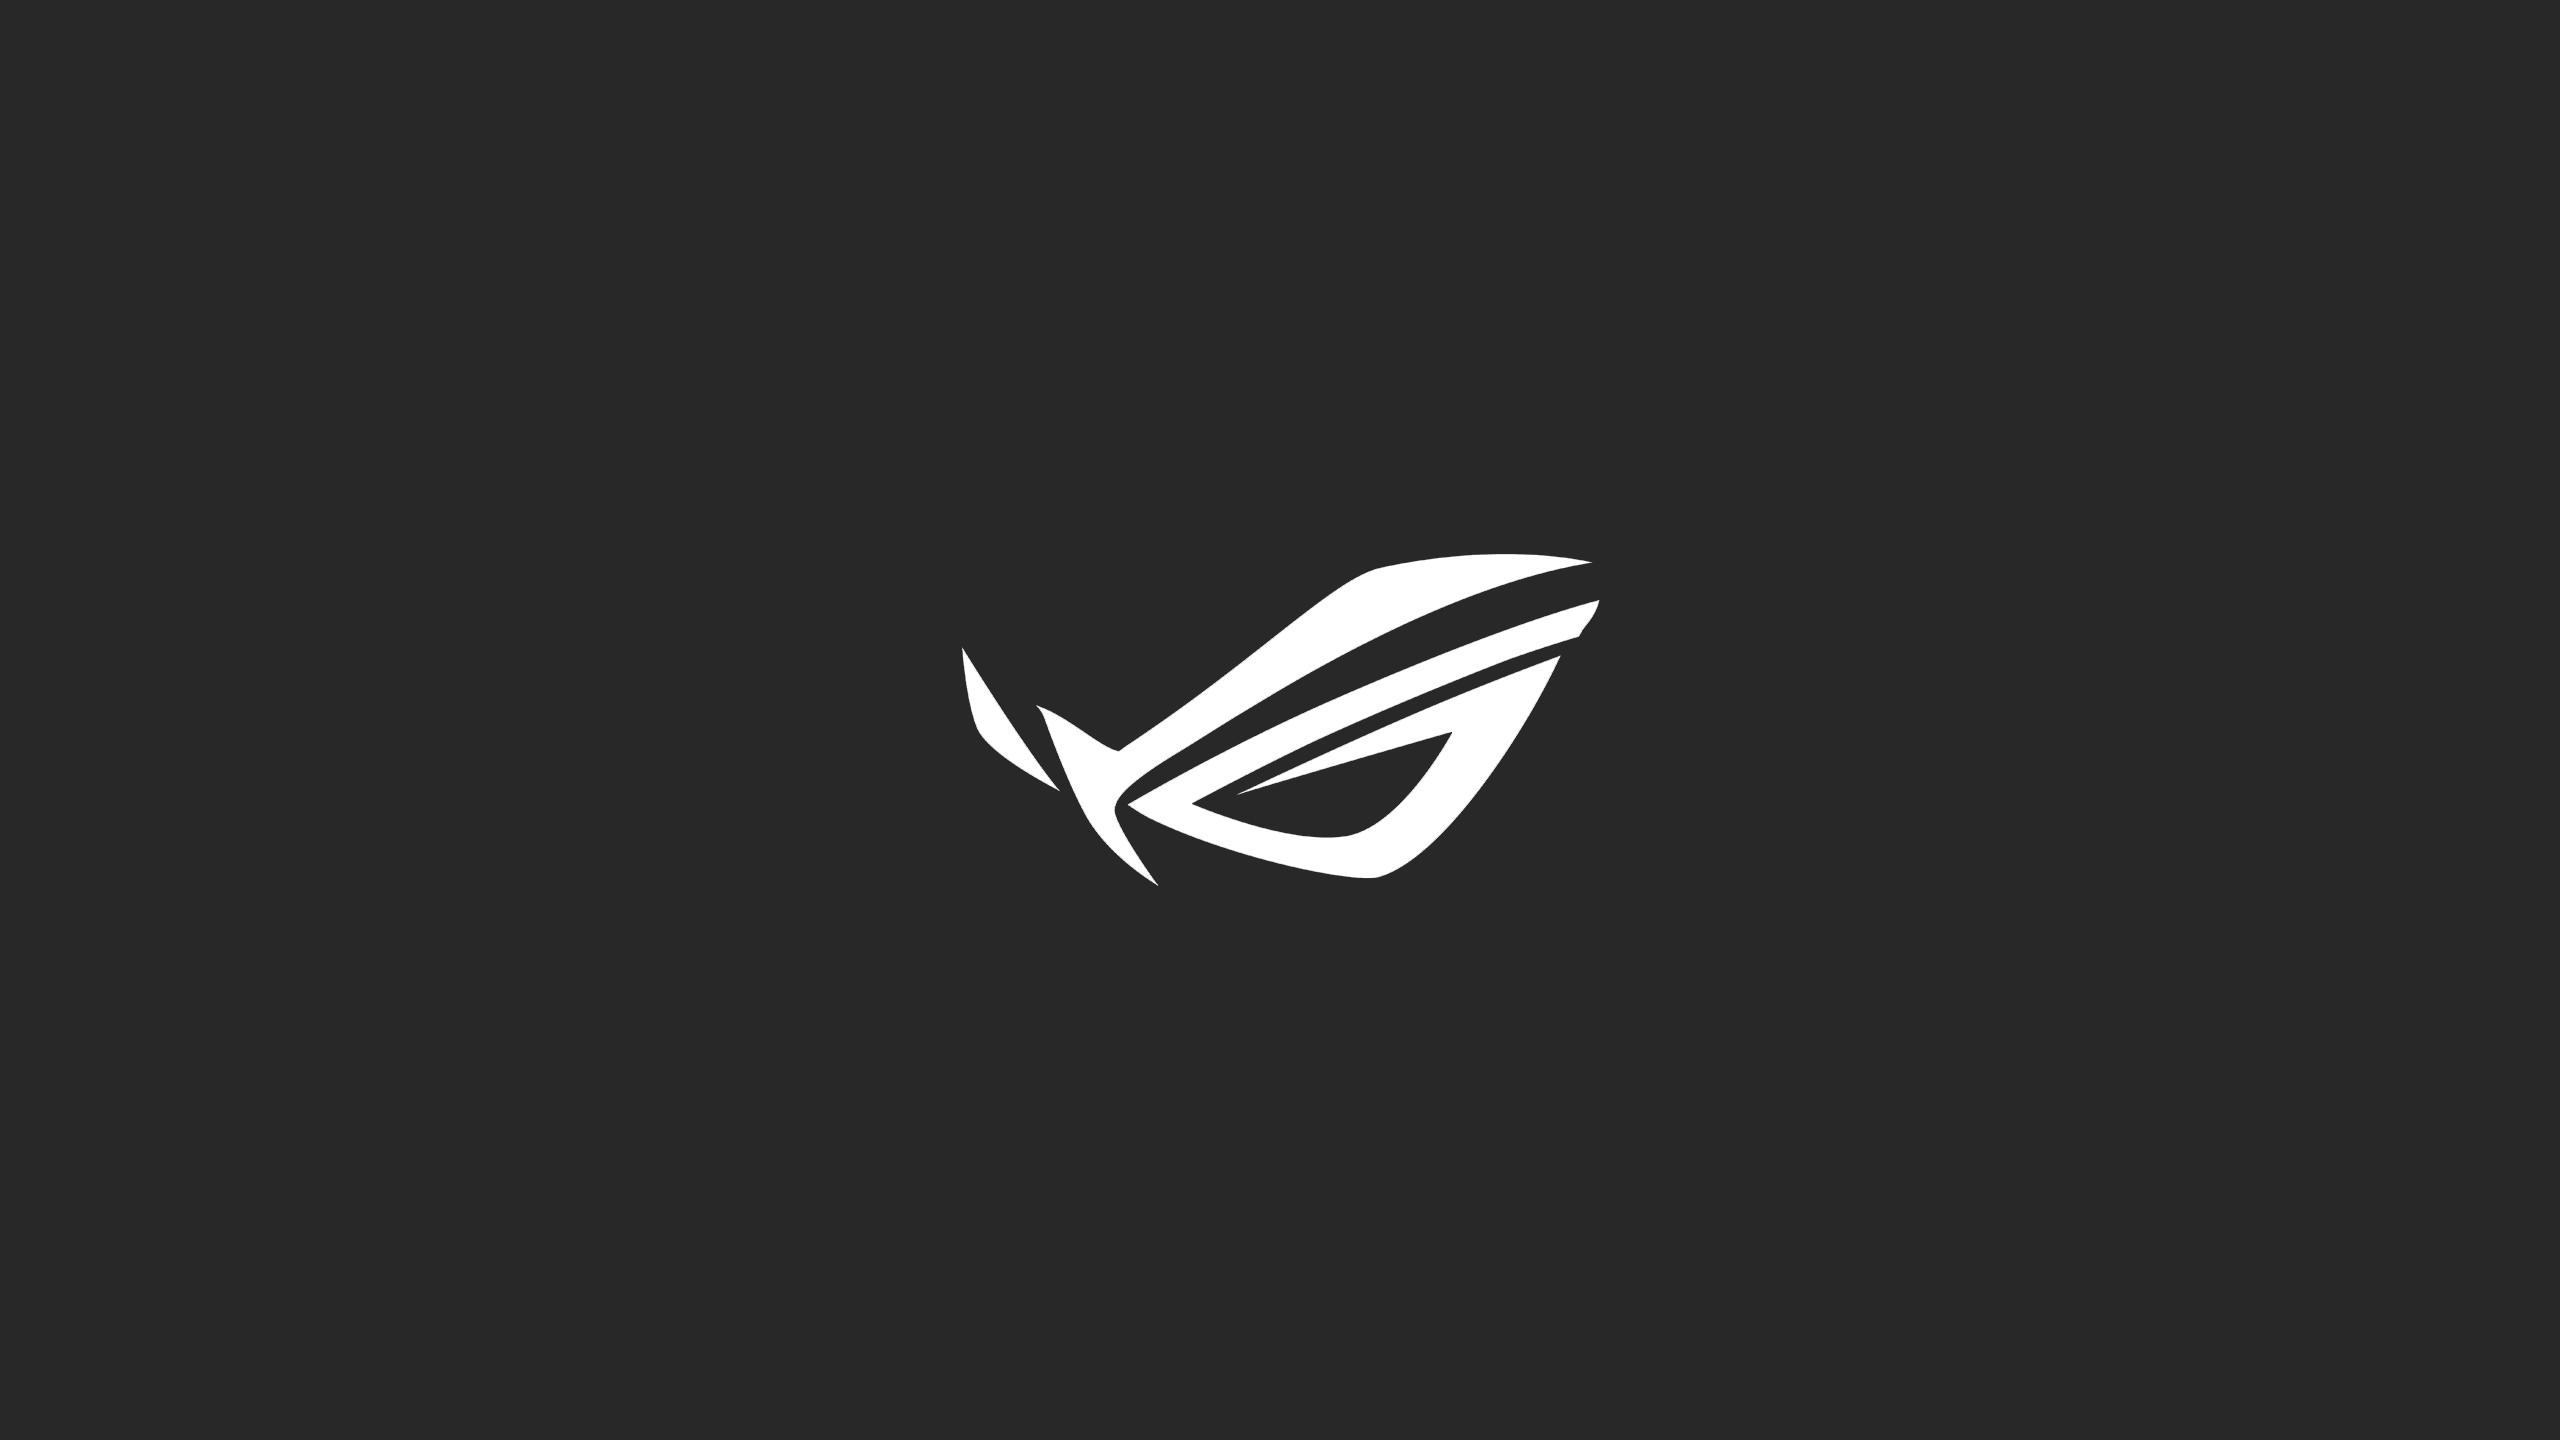 Wallpaper illustration minimalism artwork text logo - Asus gamers republic wallpaper ...